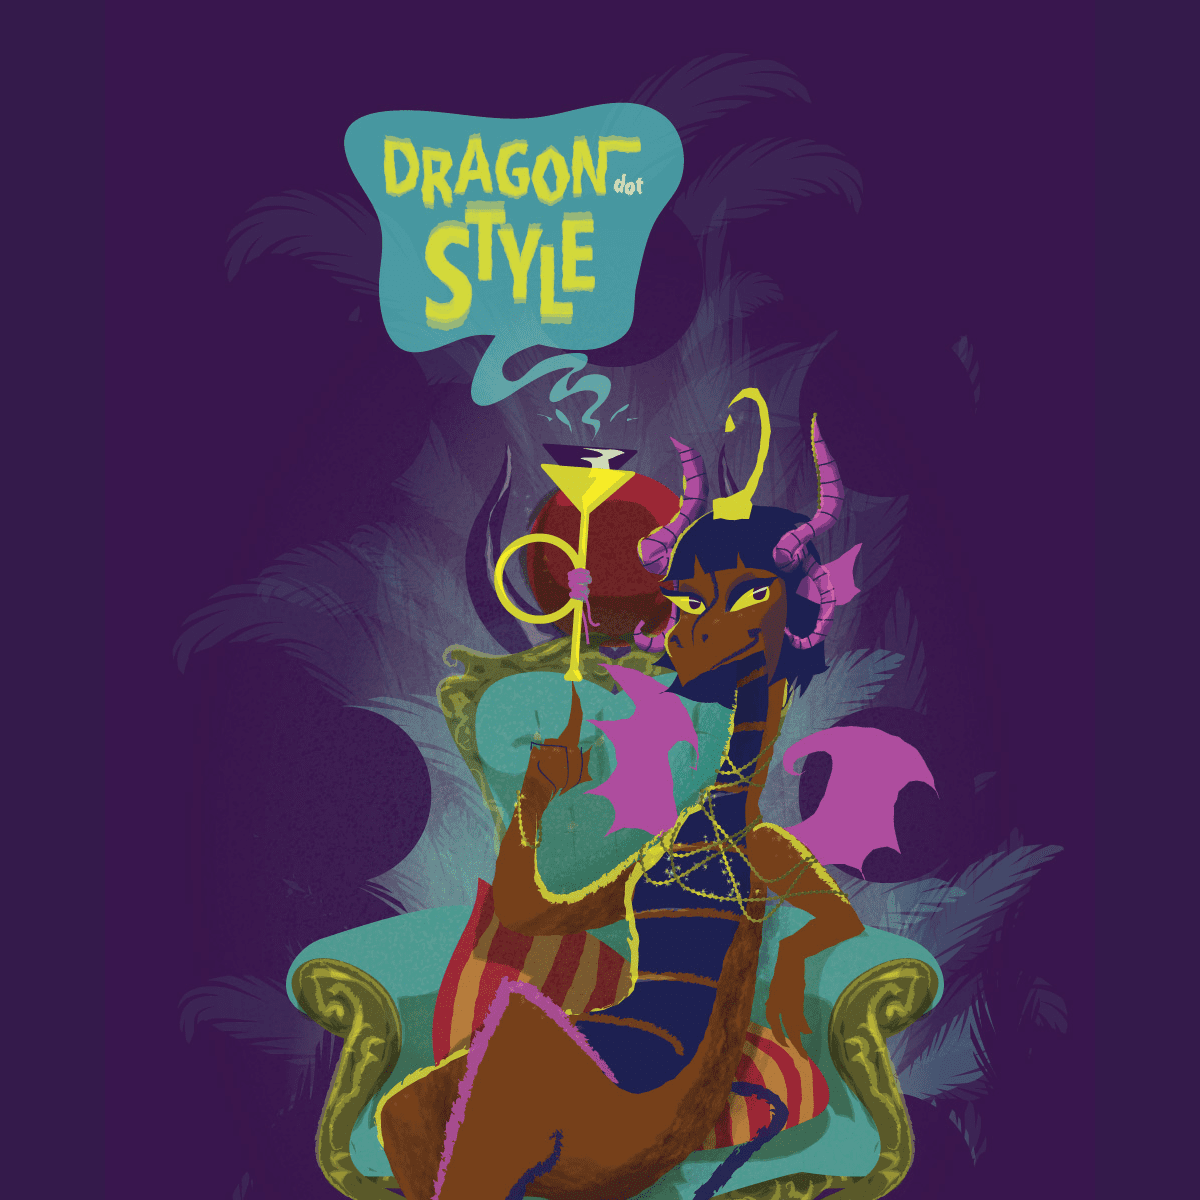 dragon.style - Dragon Style